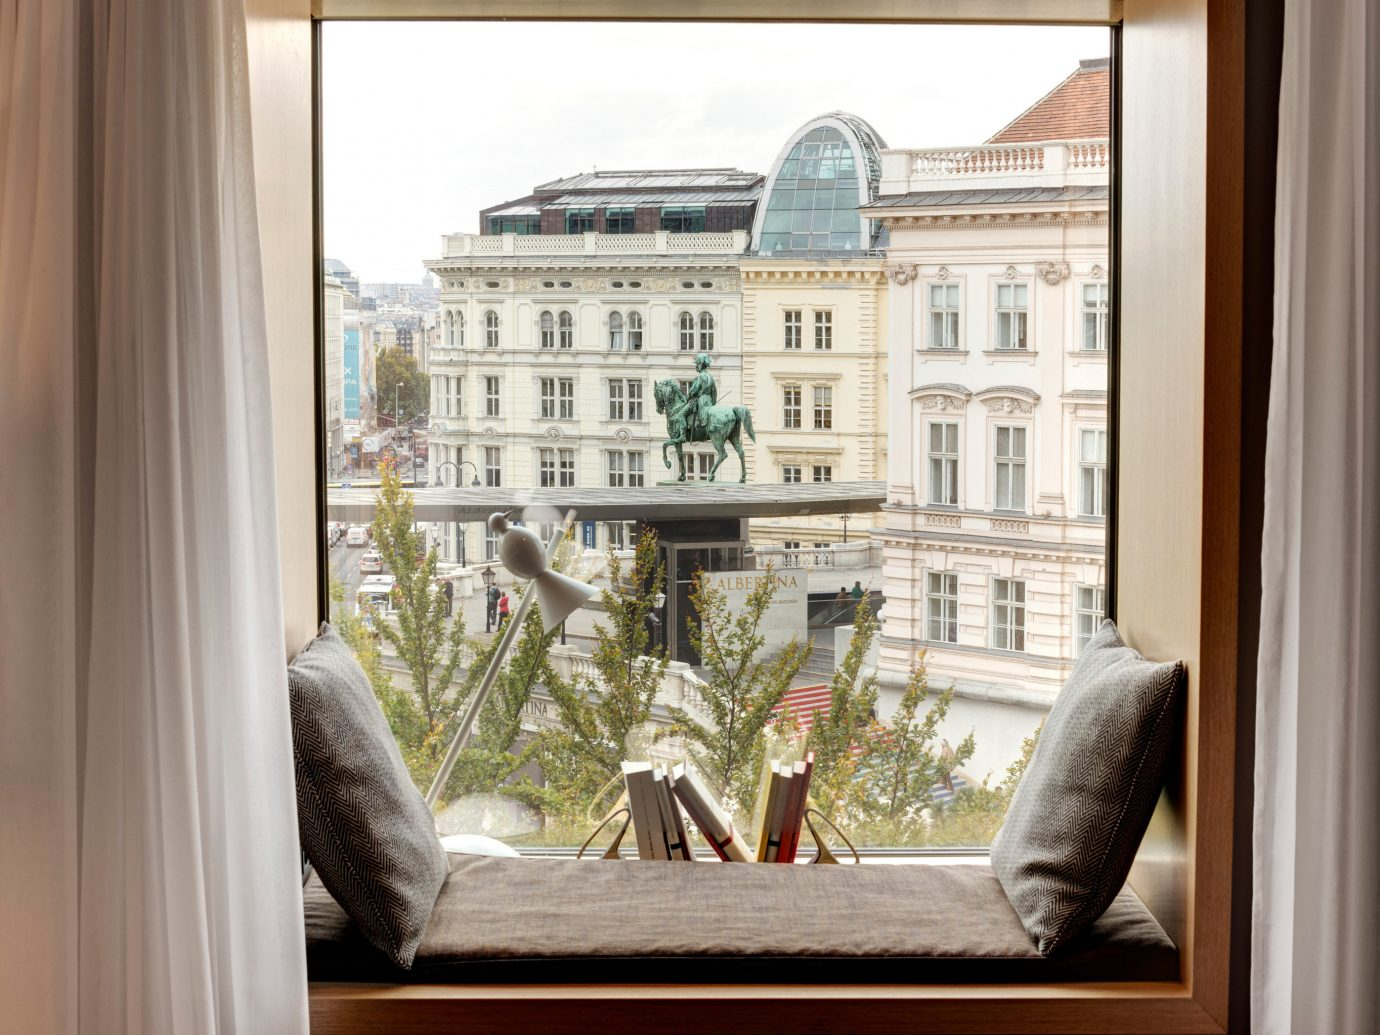 Austria europe Hotels Vienna window cat indoor property home interior design apartment Balcony house picture frame window treatment furniture sash window door facade